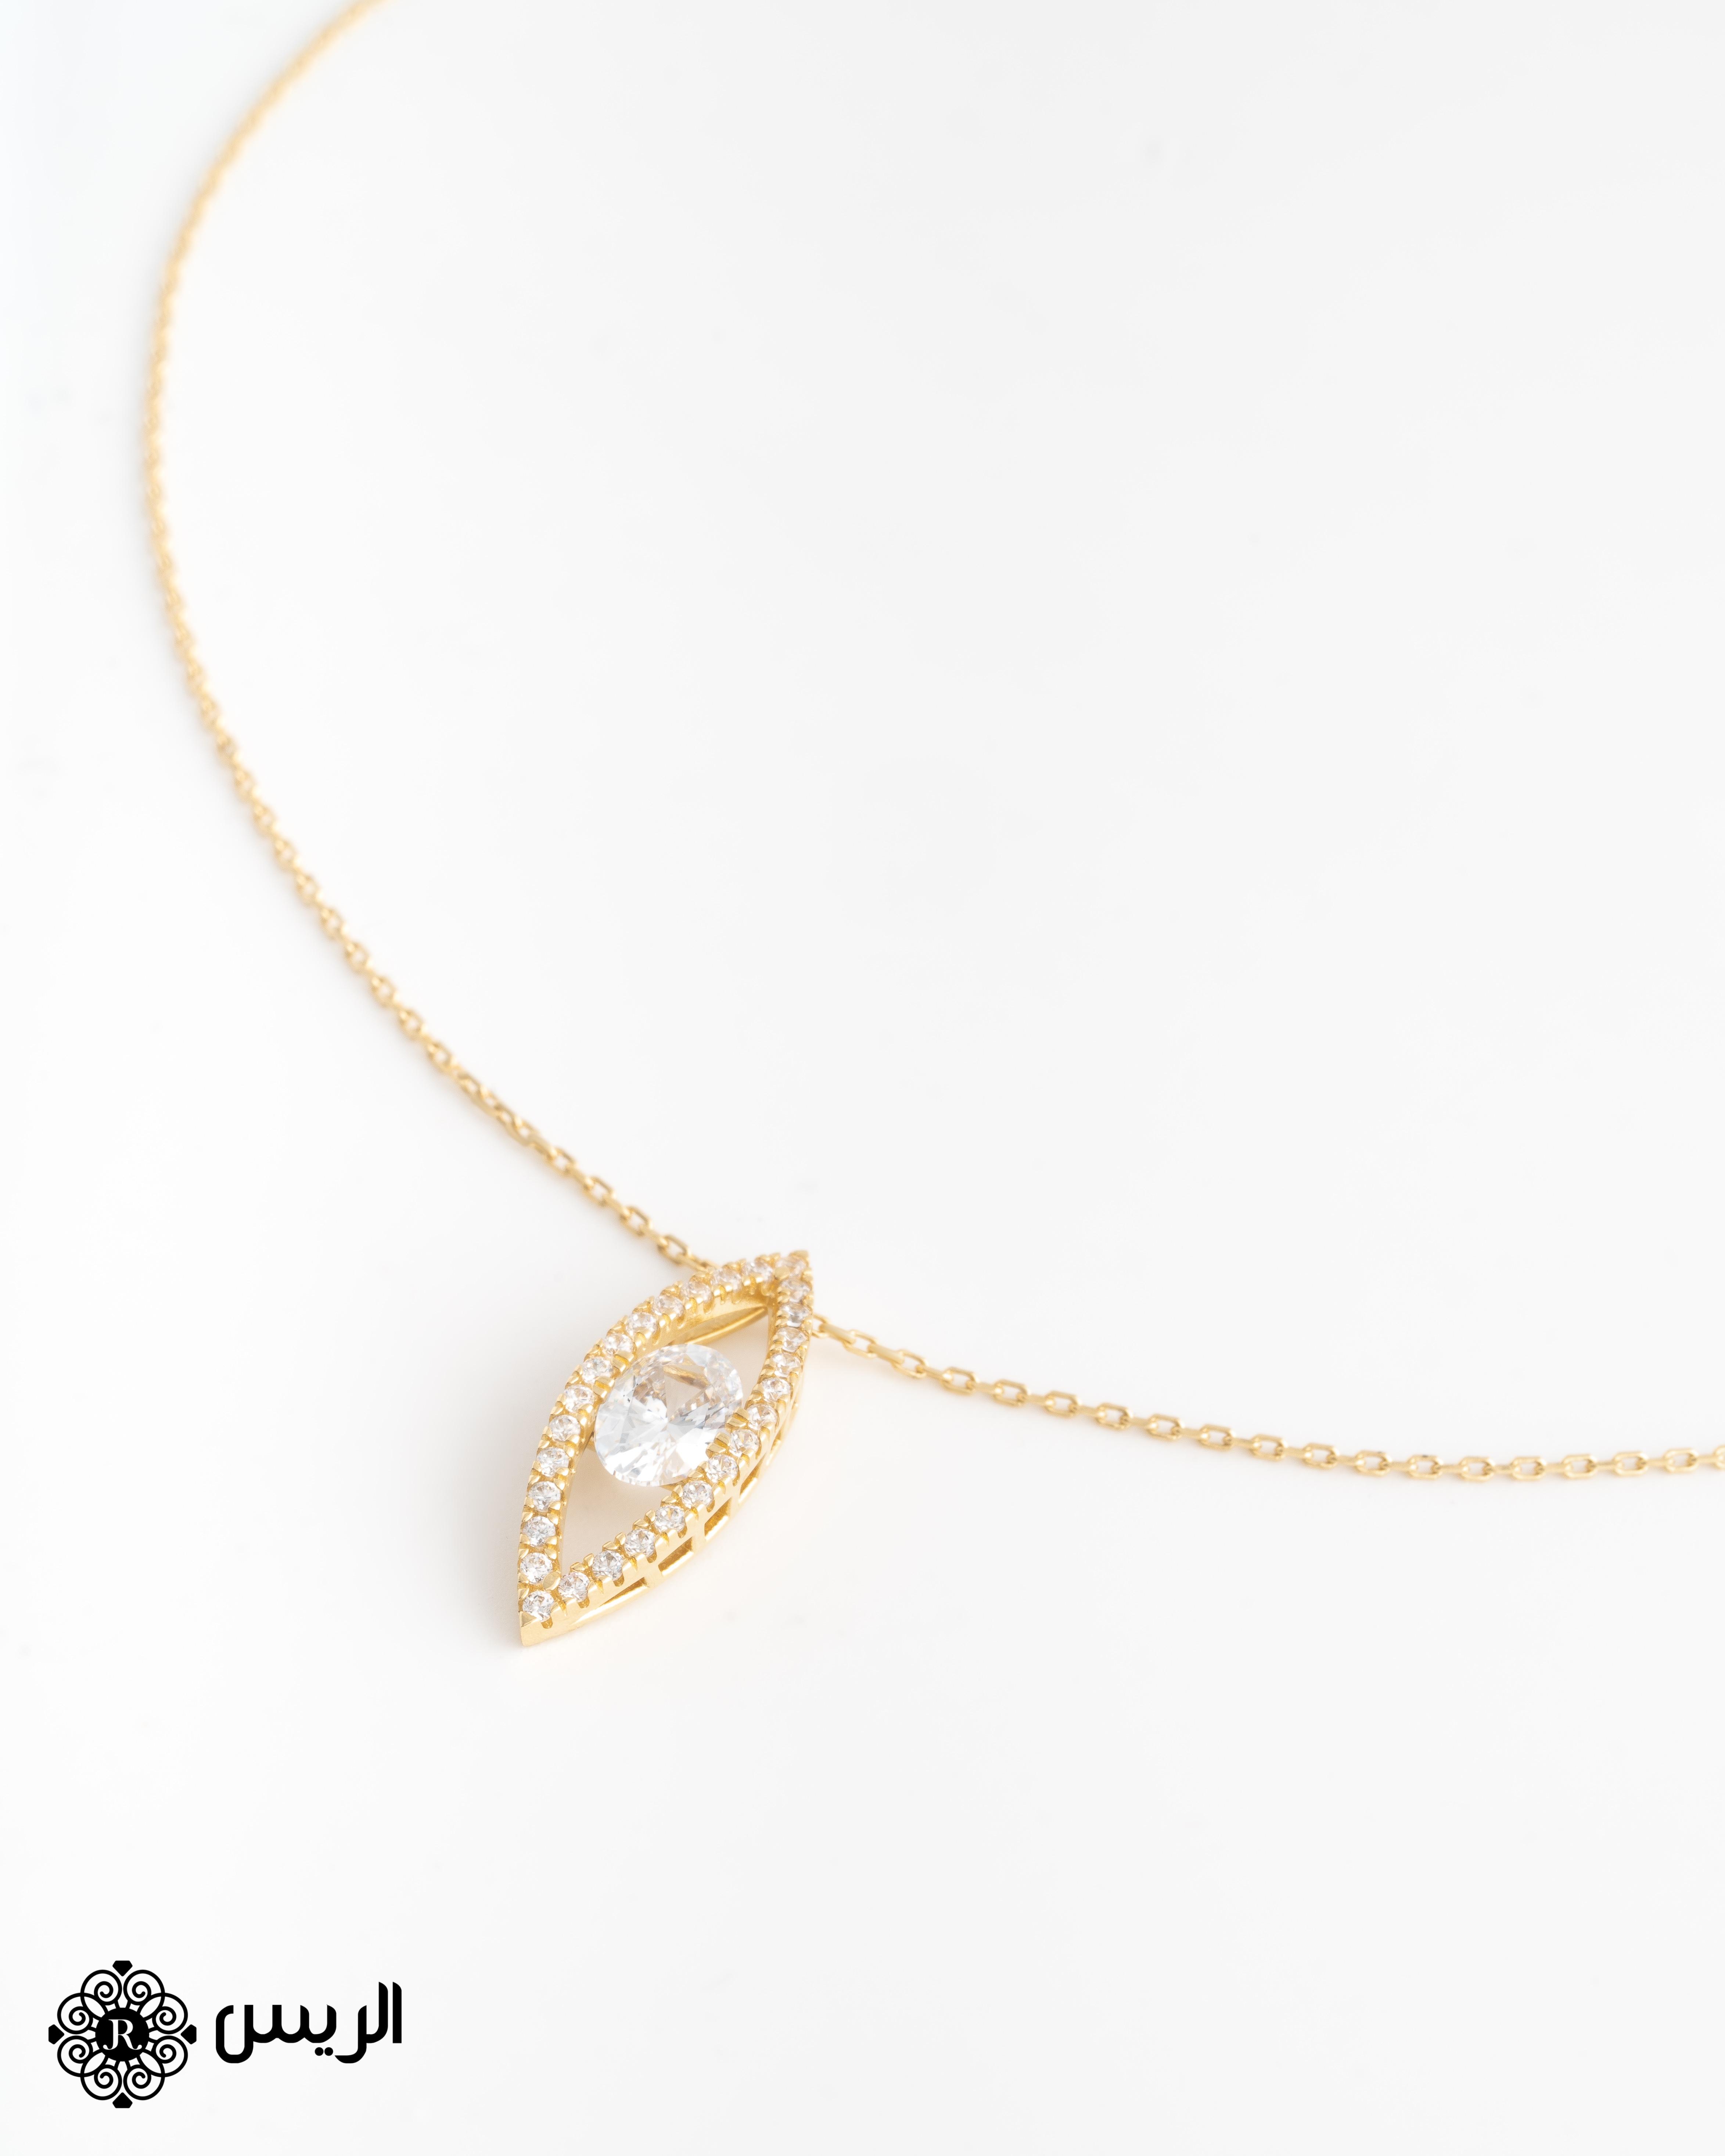 Raies jewelry Solitaire Half Set نصف طقم سوليتير الريس للمجوهرات